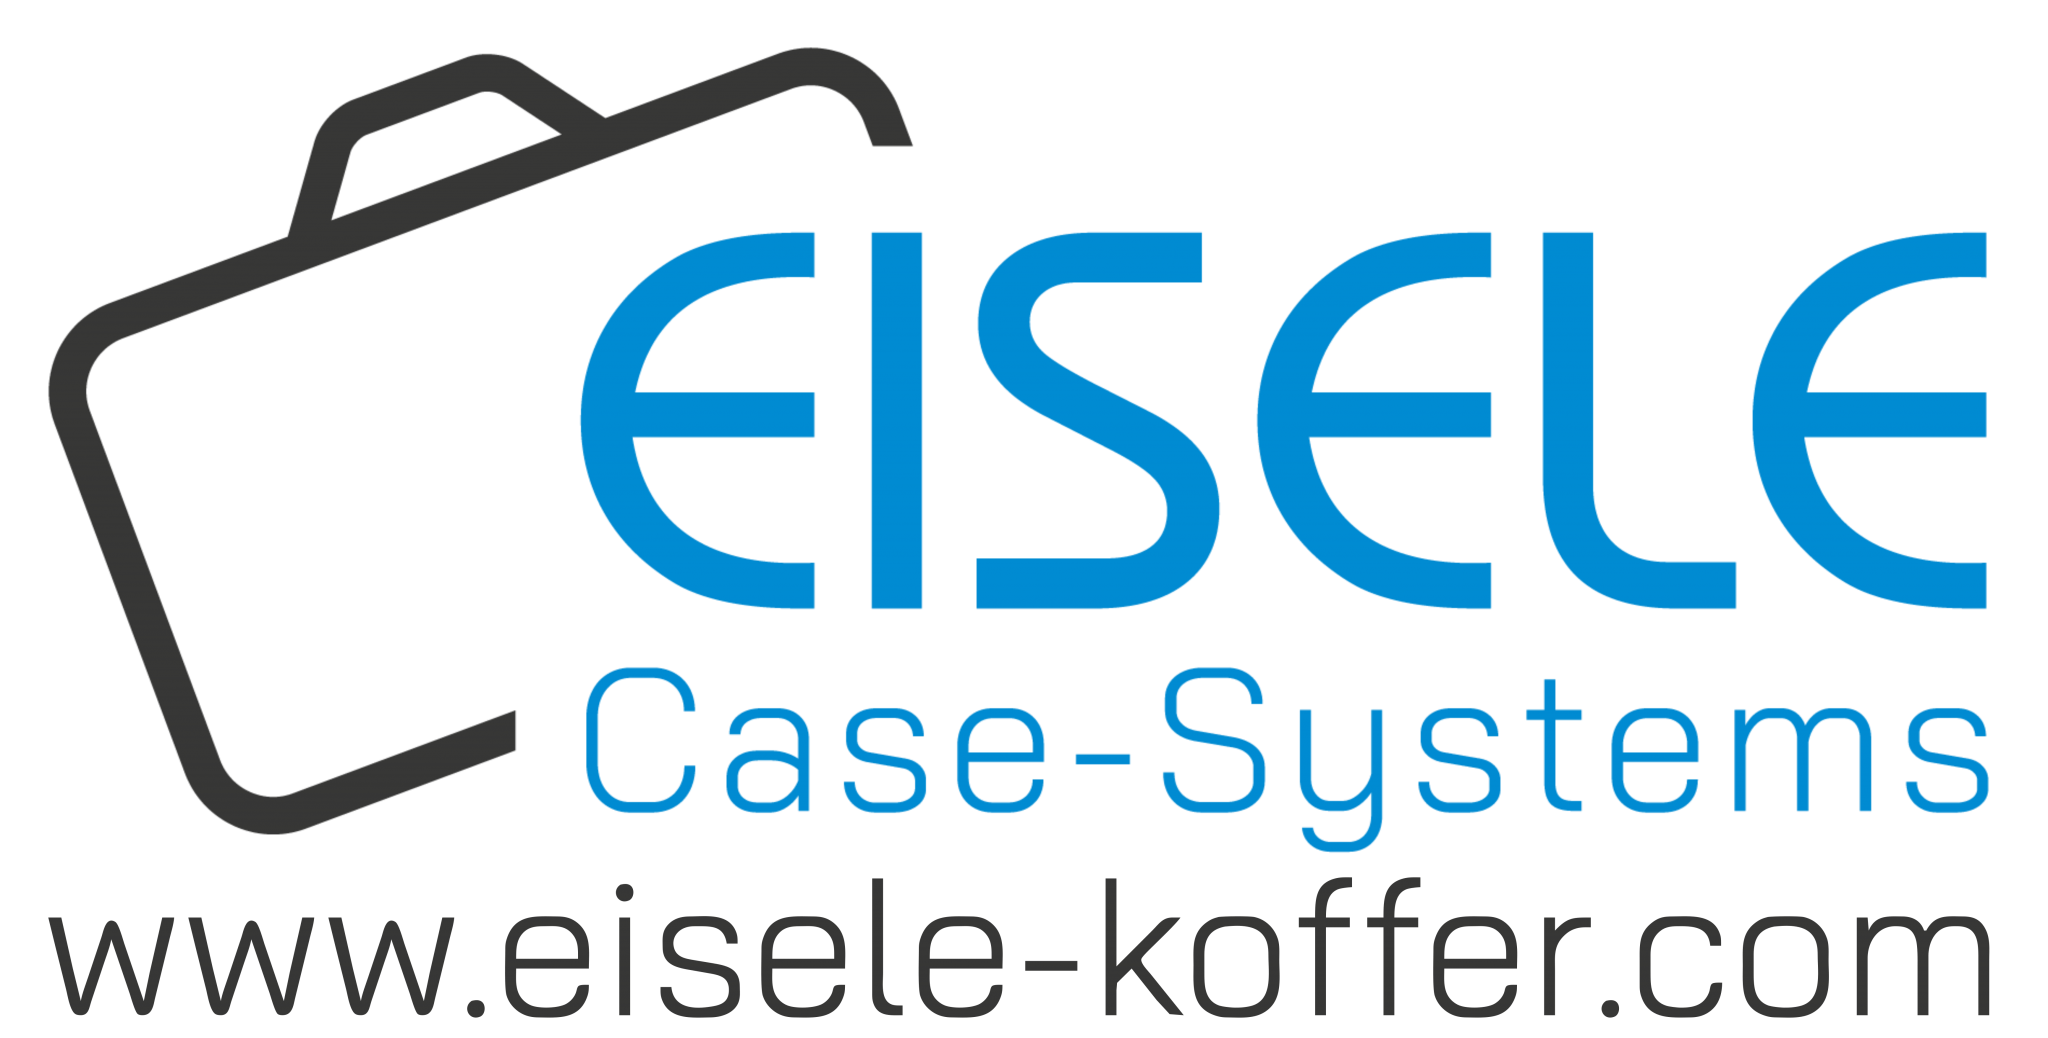 Eisele Case-Systems